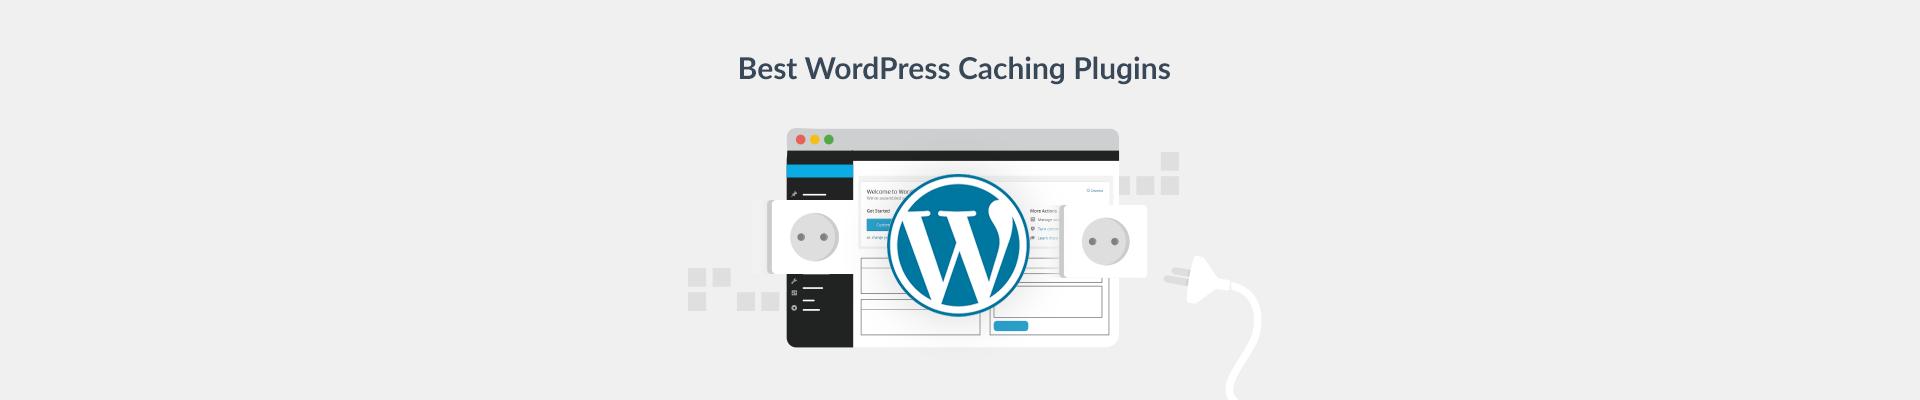 WordPress Caching Plugins Plesk